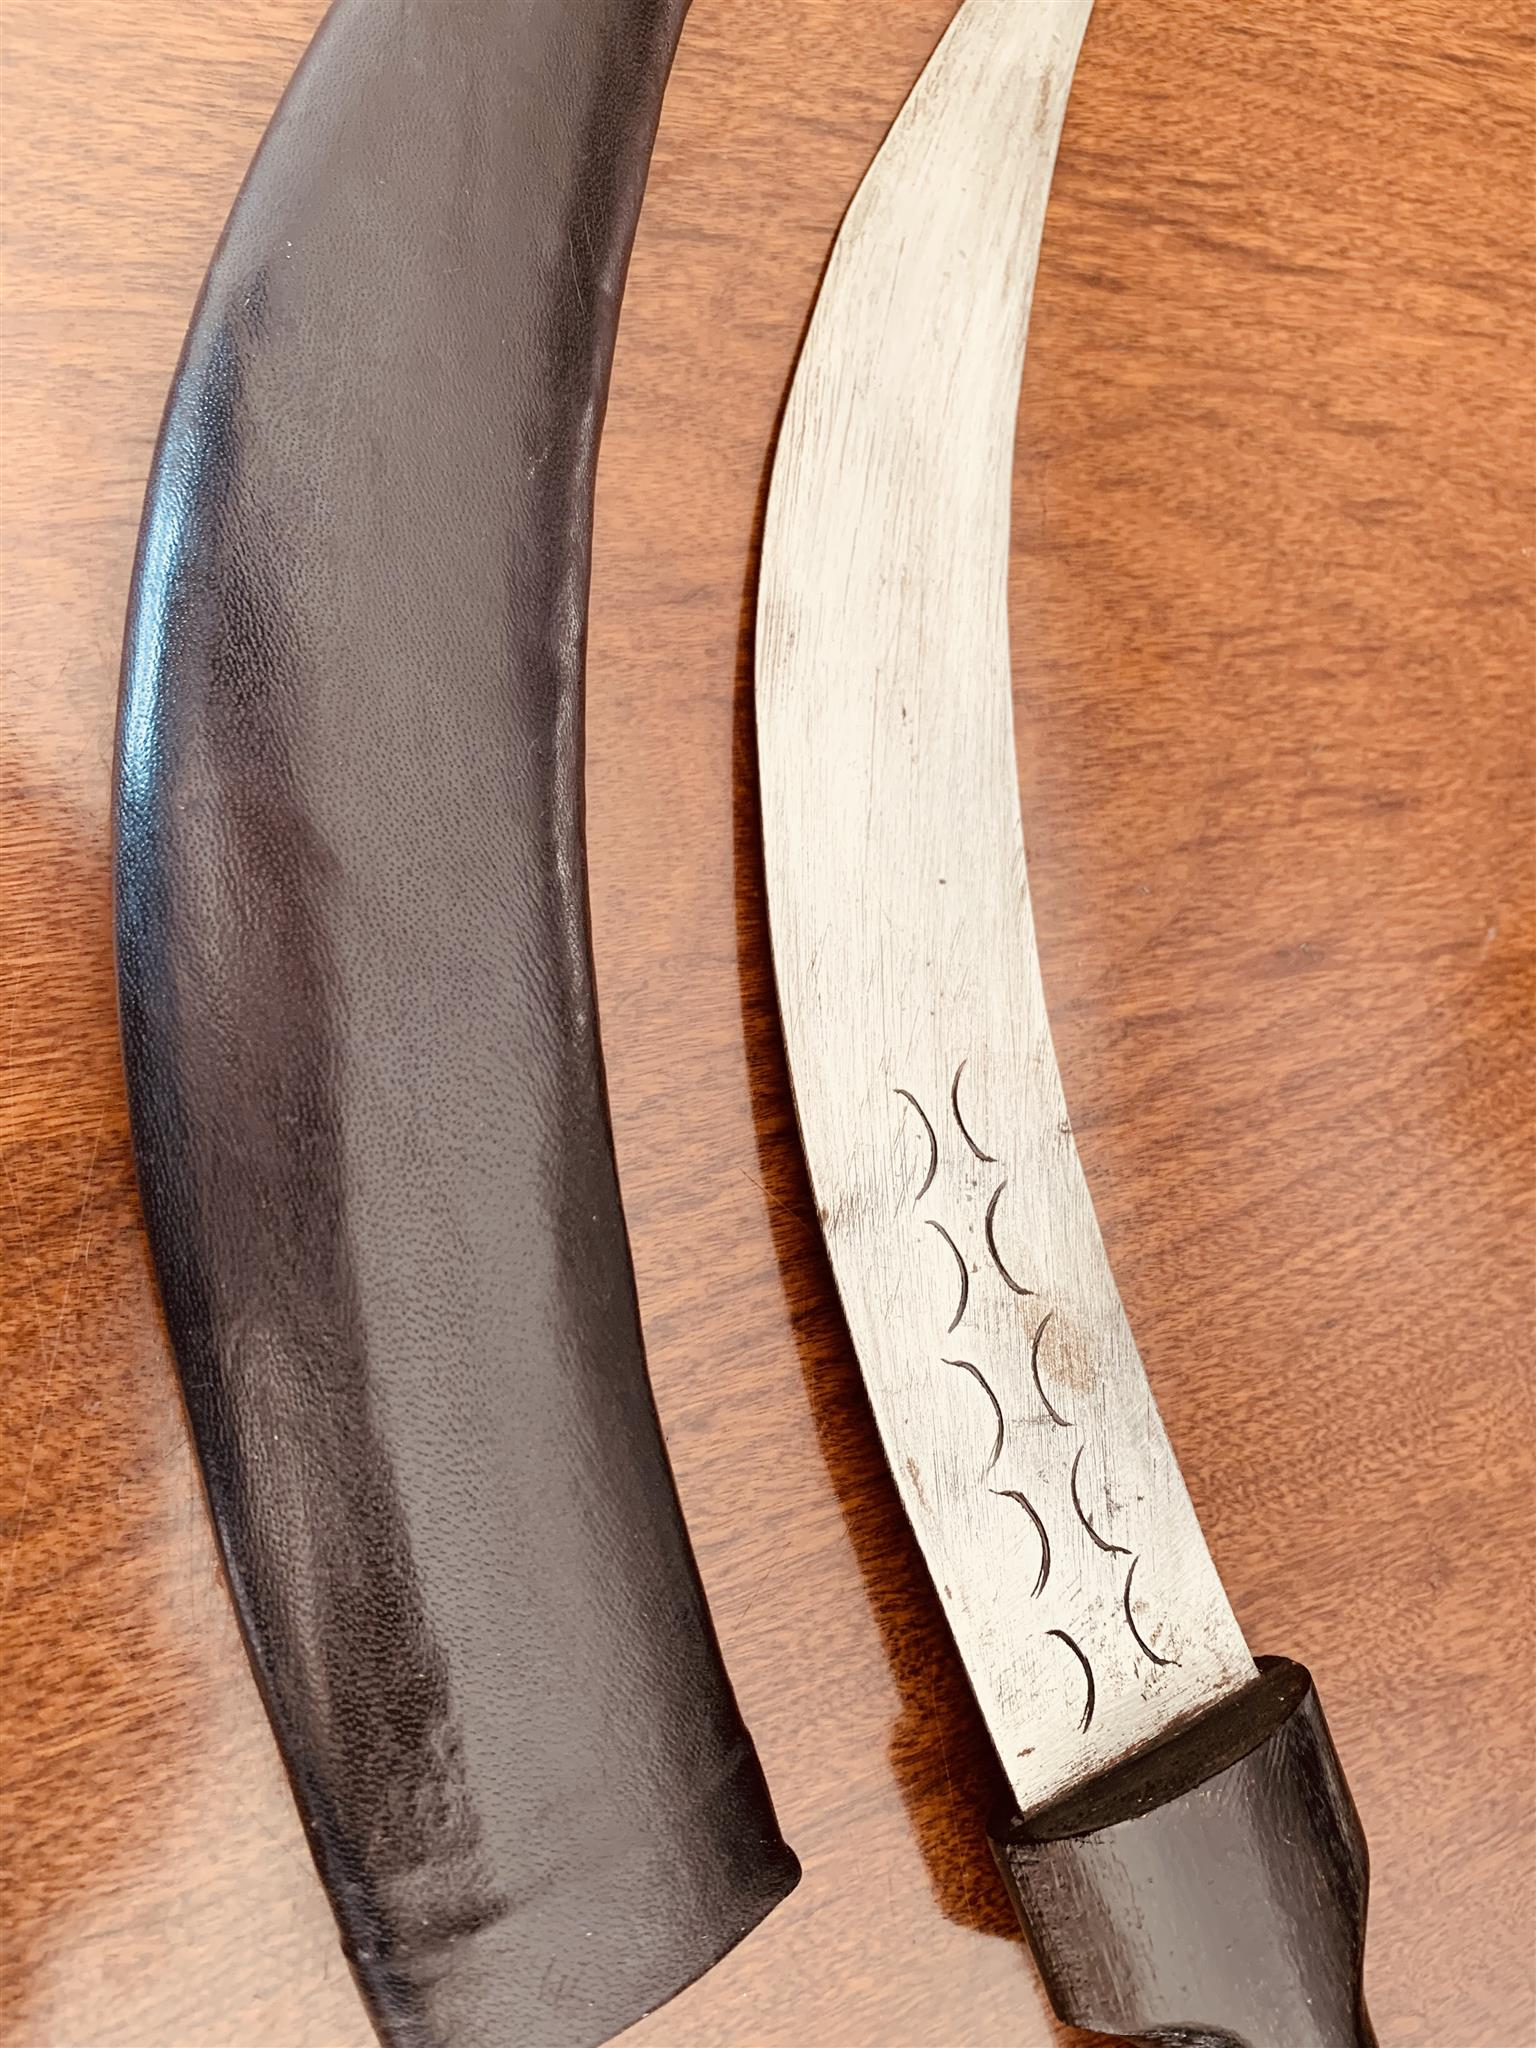 Knives swords African kukri